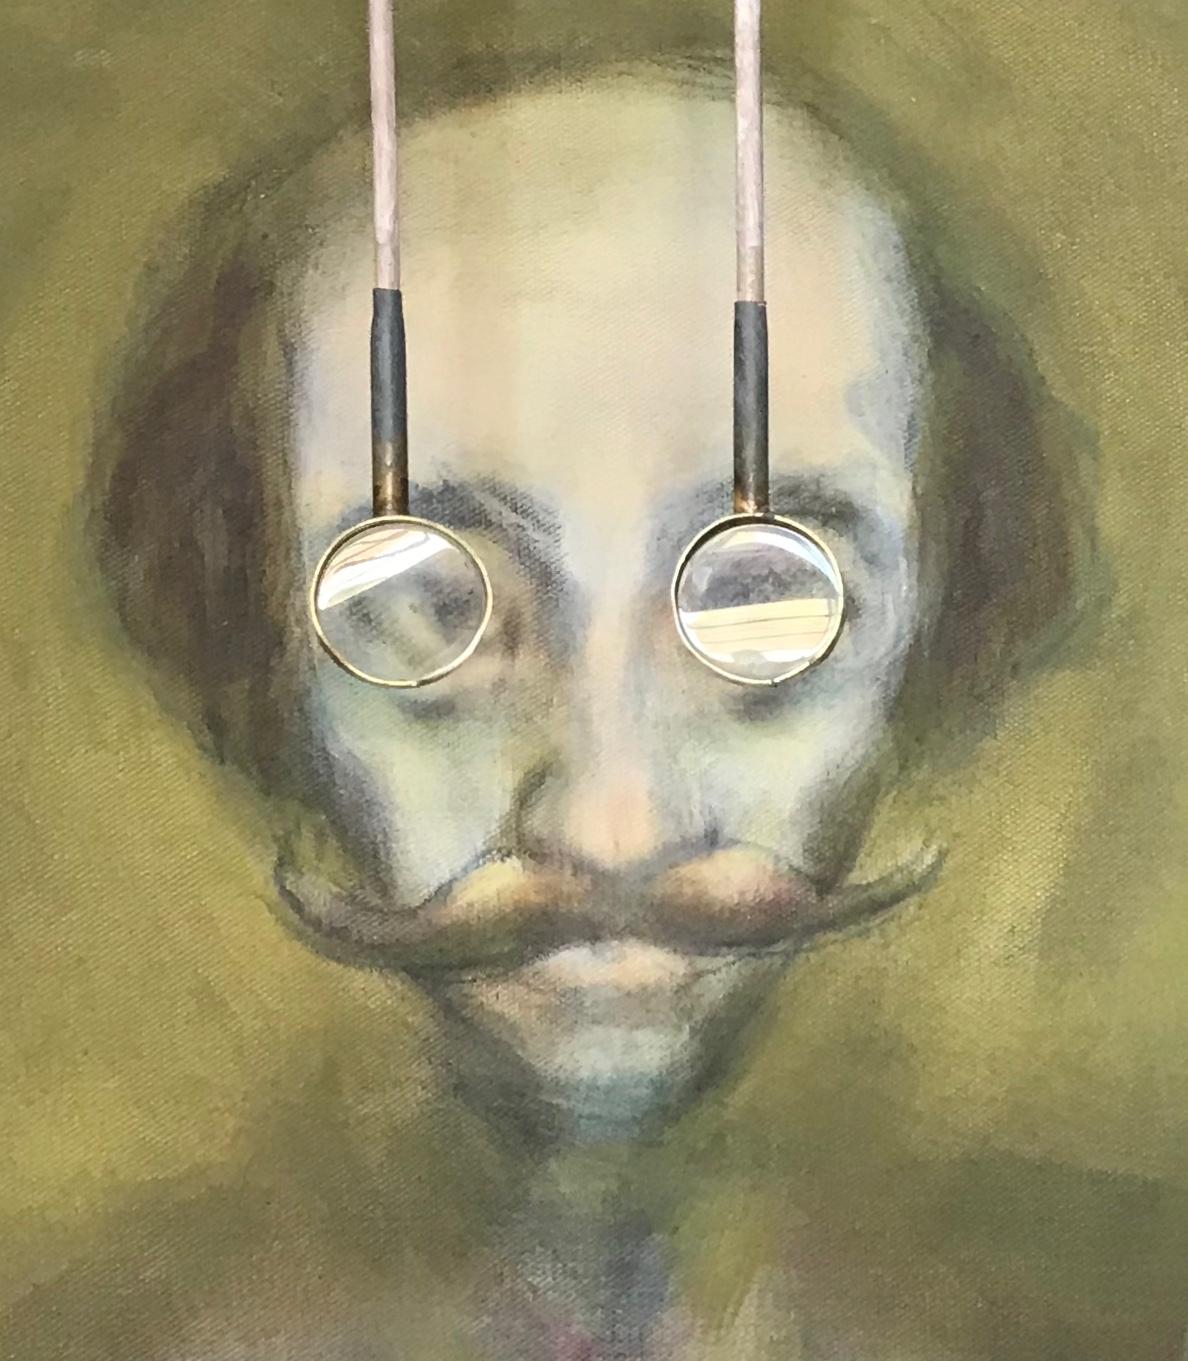 doug-selway-artist-3-head-painting-with-amplifiers.jpg